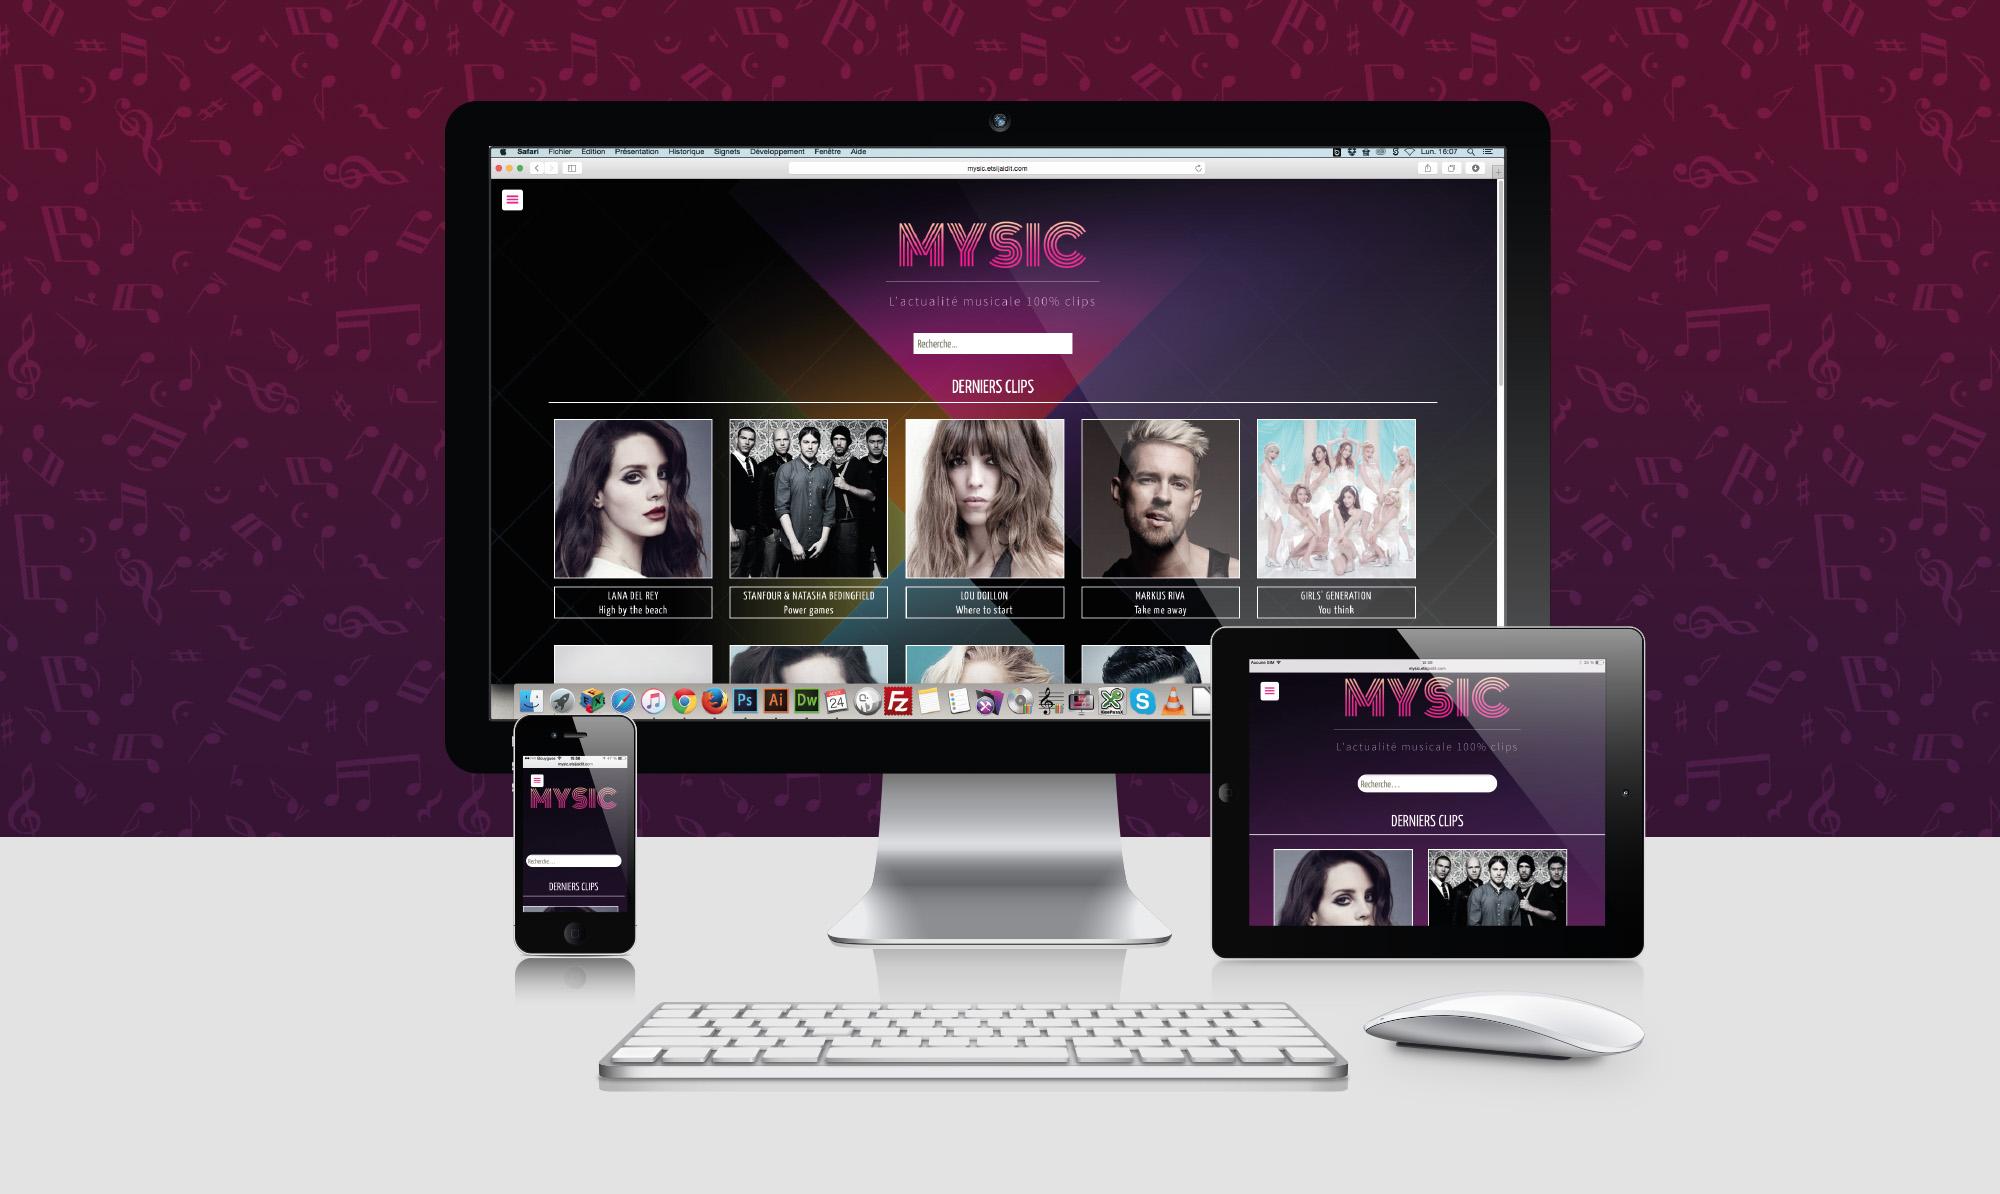 Mysic